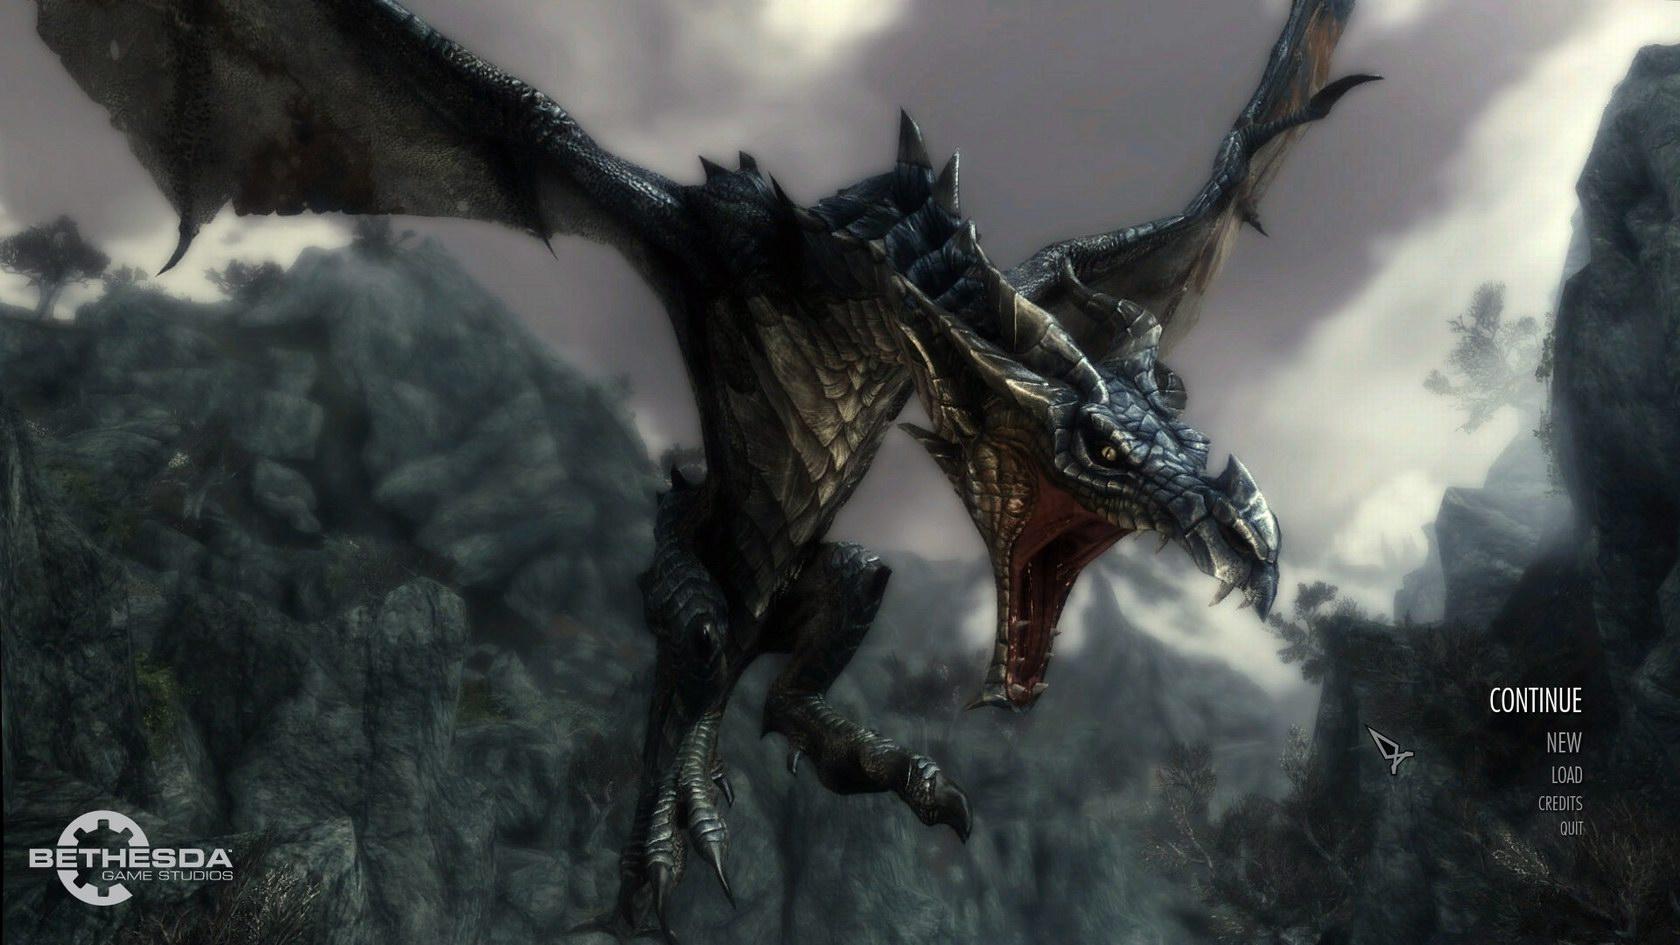 Skyrim Dragonborn Wallpaper 1080p Games Wallpapers Doocab 1680x945